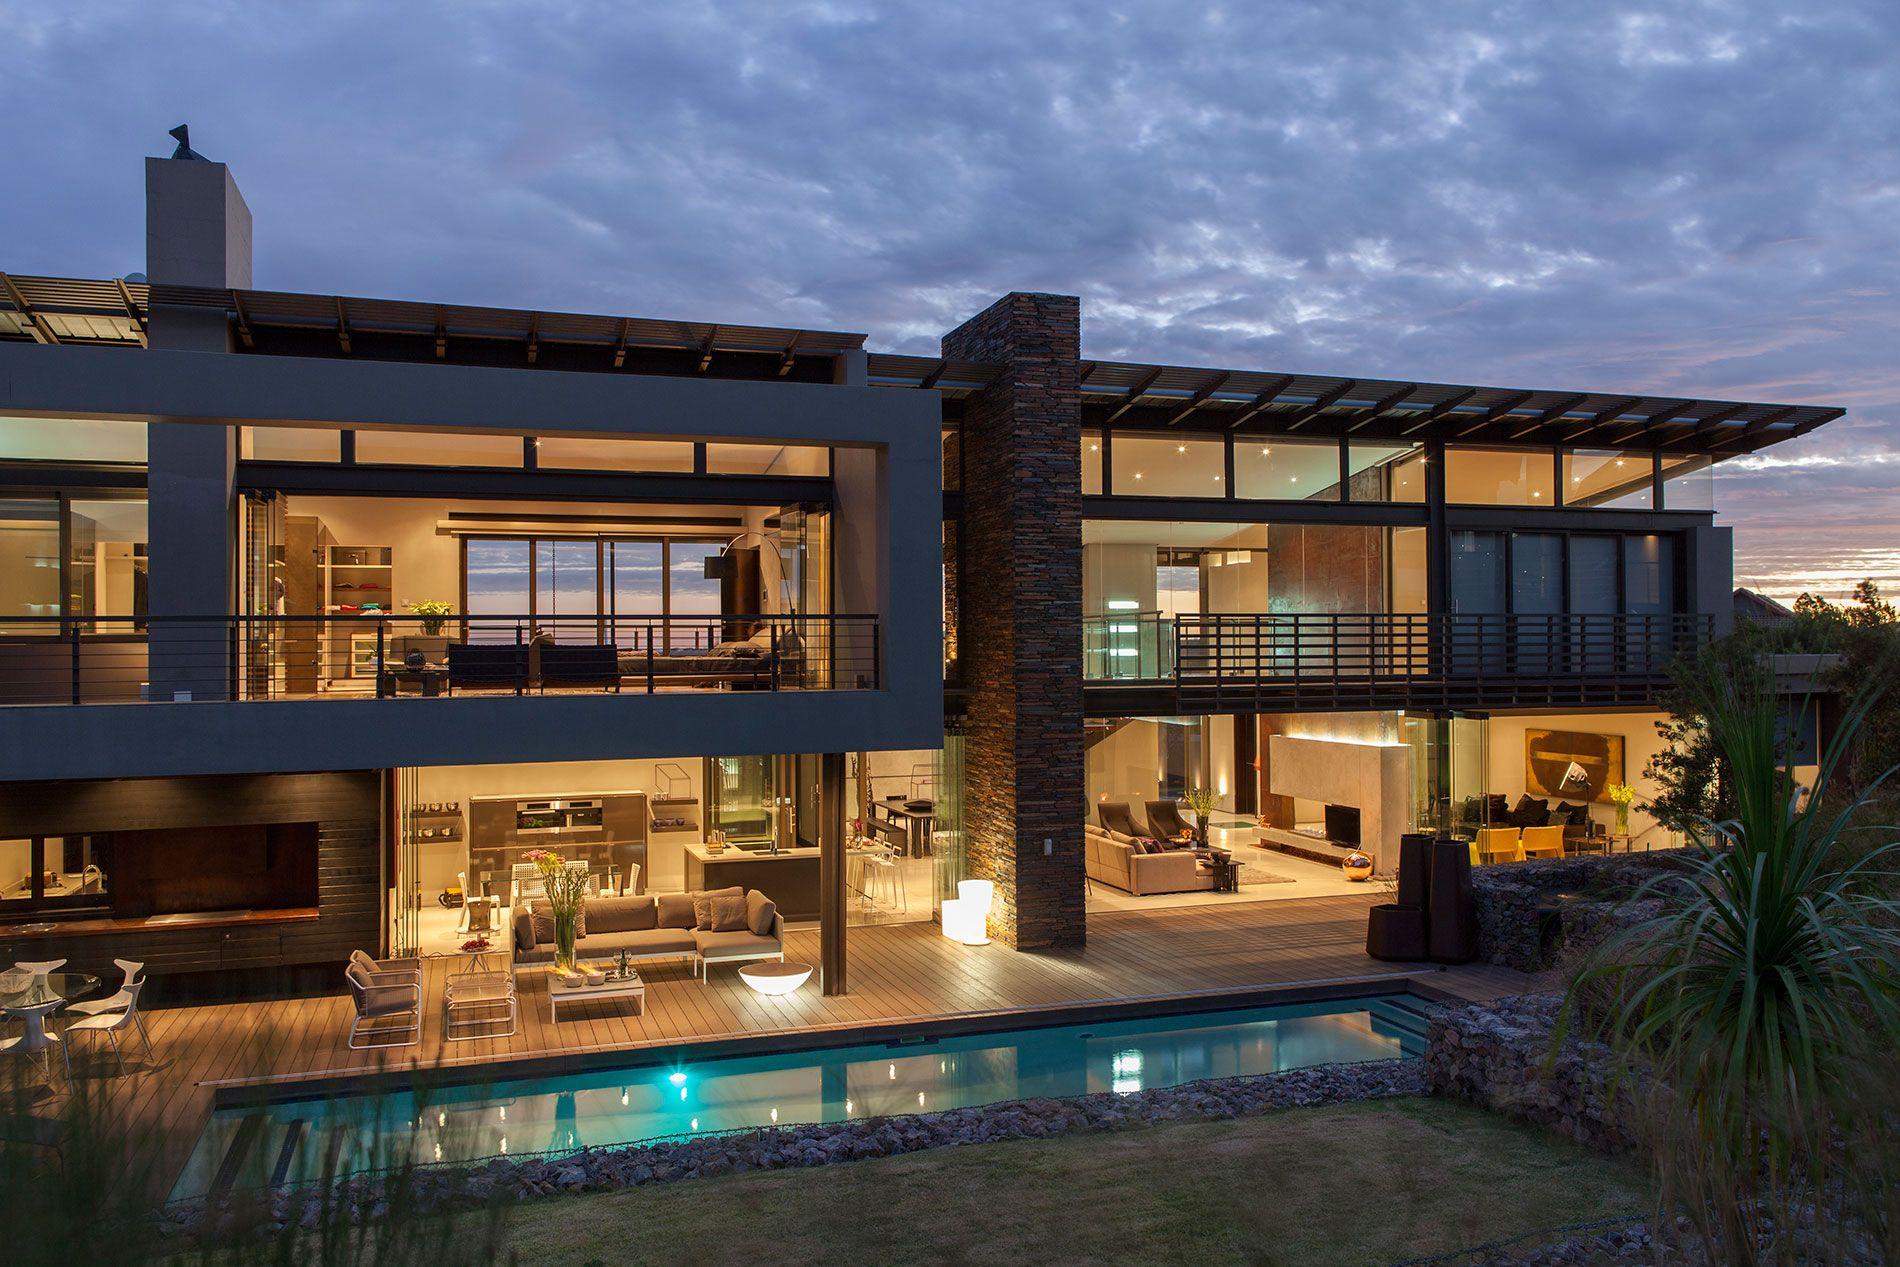 Casa Moderna Grande Big Modern Houses Best Modern House Design House Architecture Design